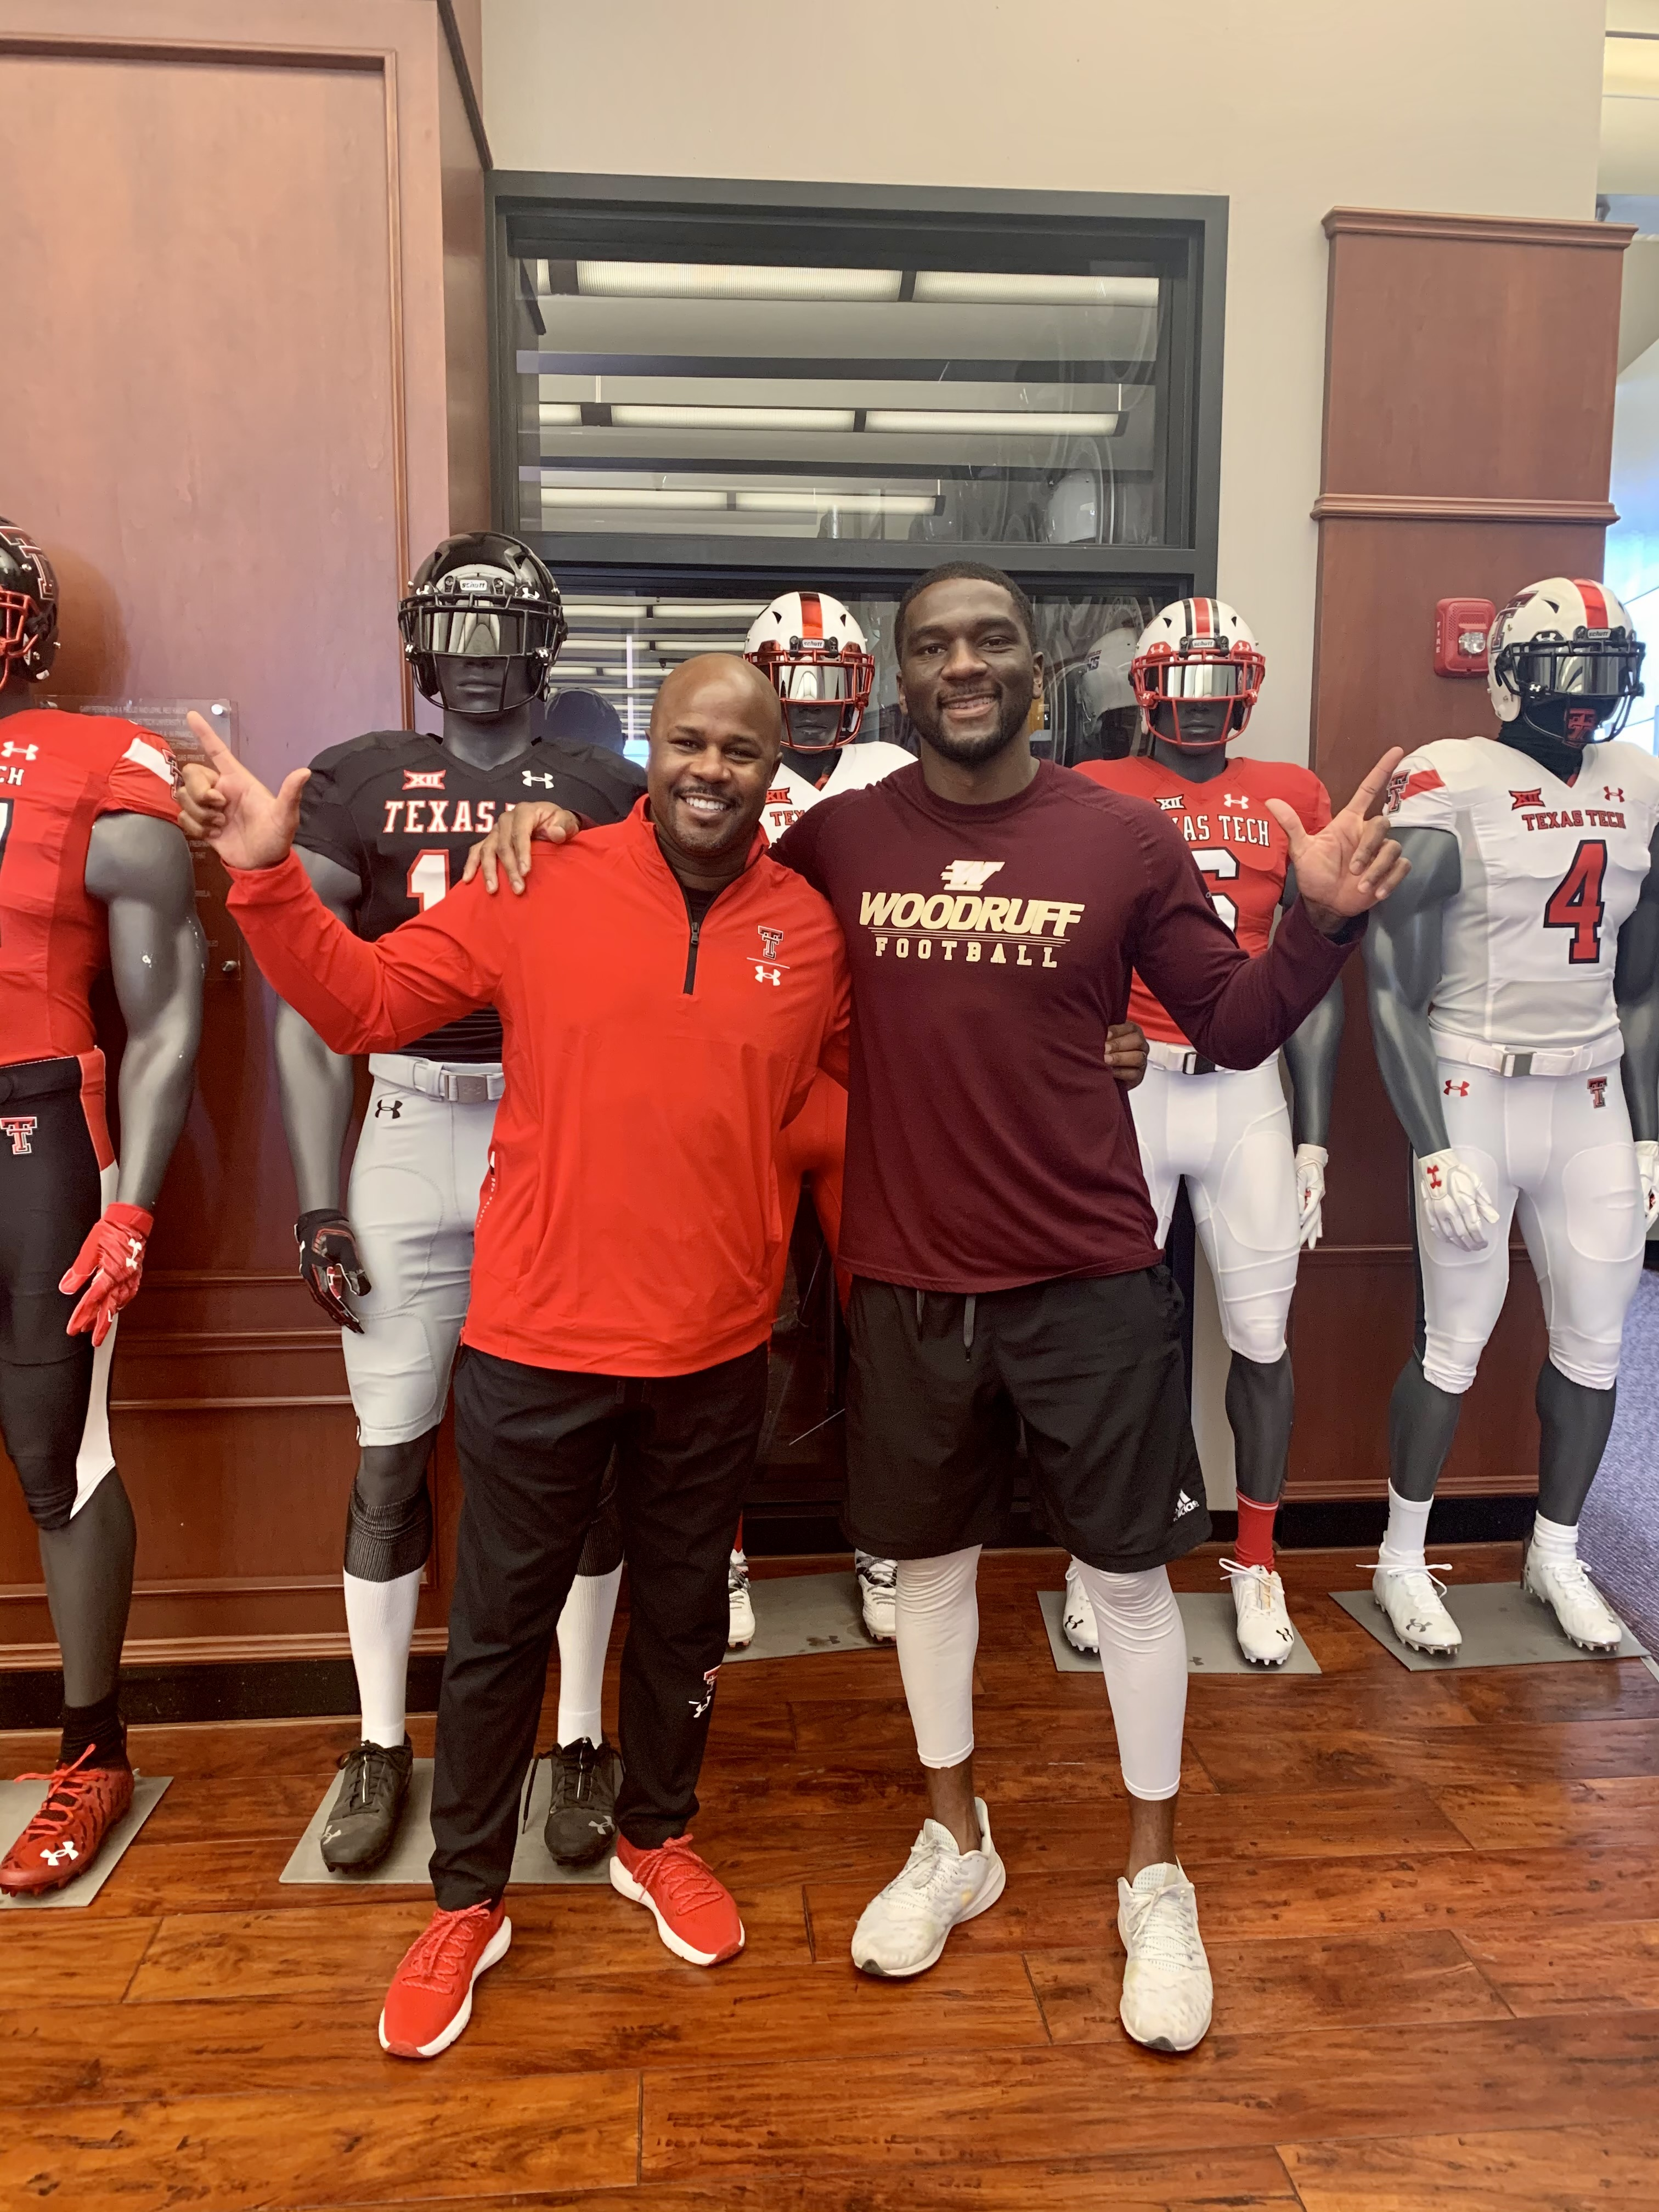 Jones and Johnson Unite at Texas Tech